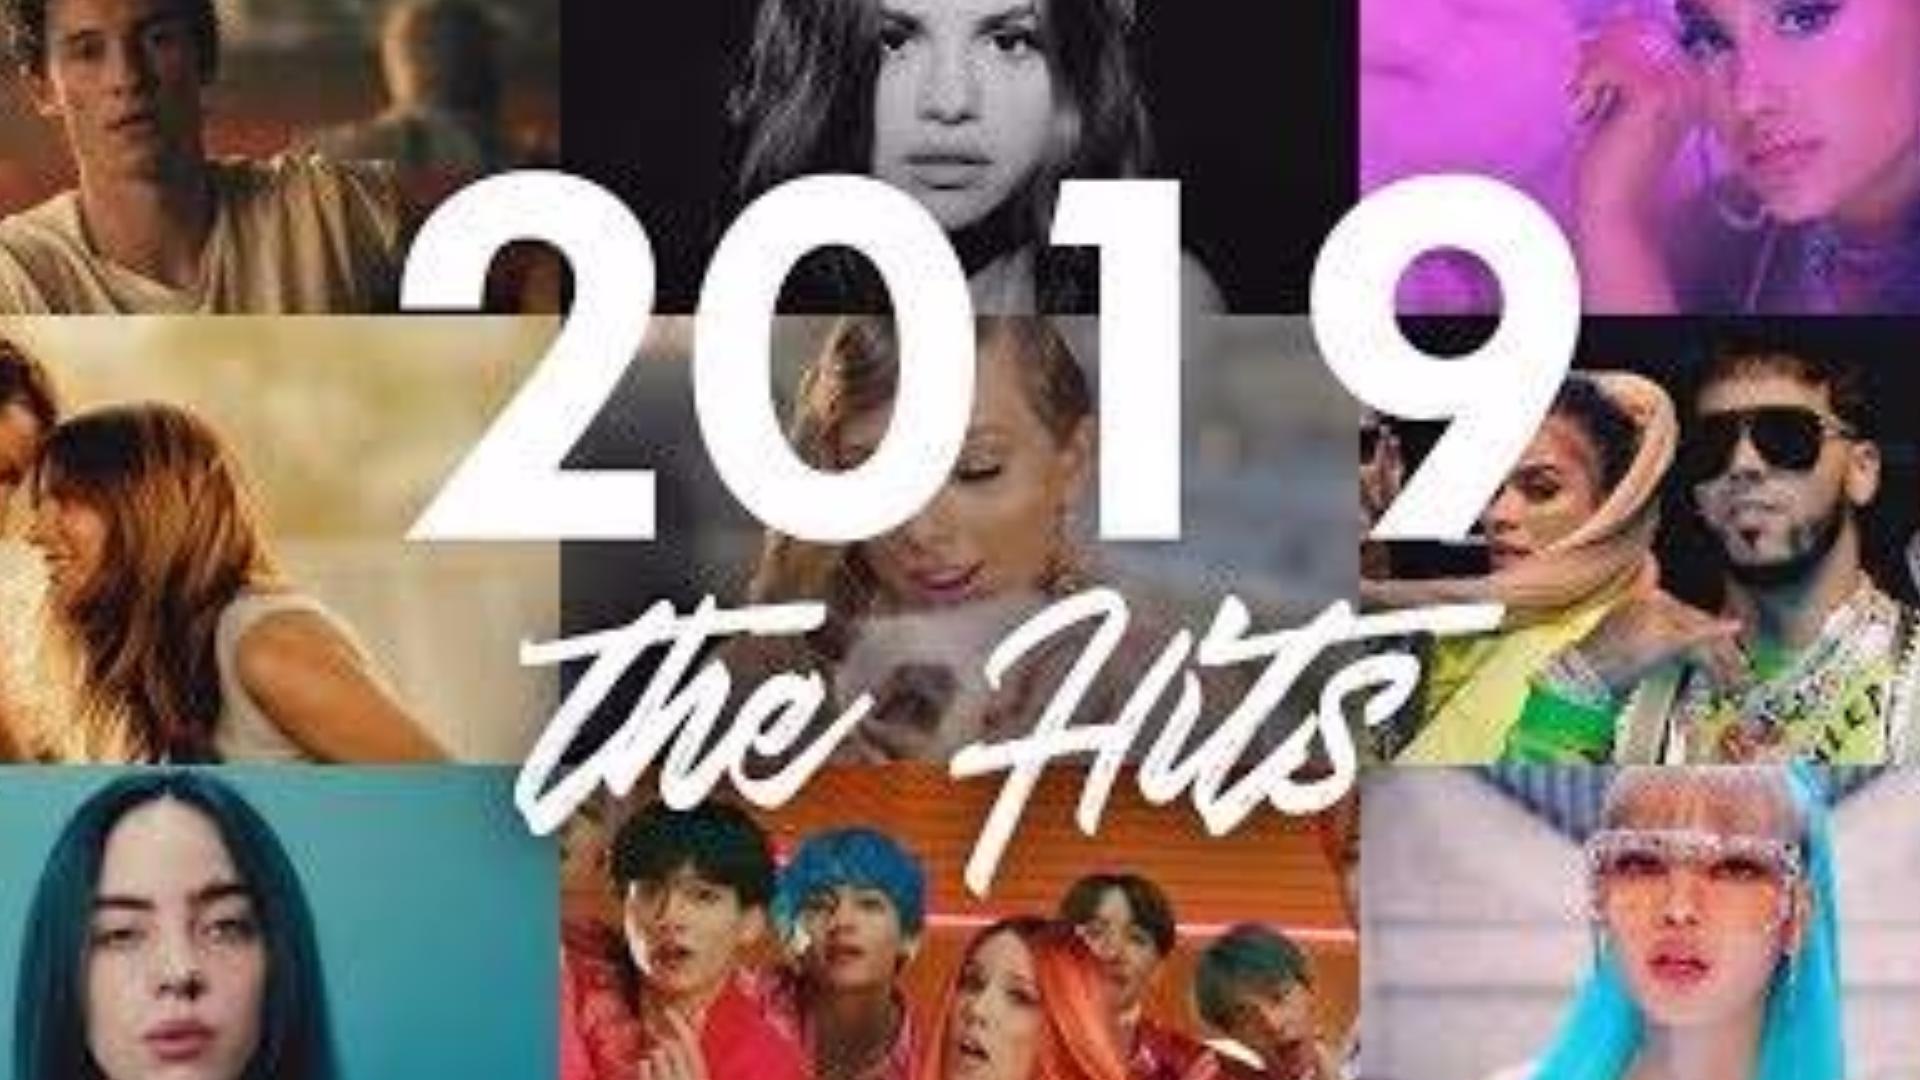 超好听混音!HITS OF 2019